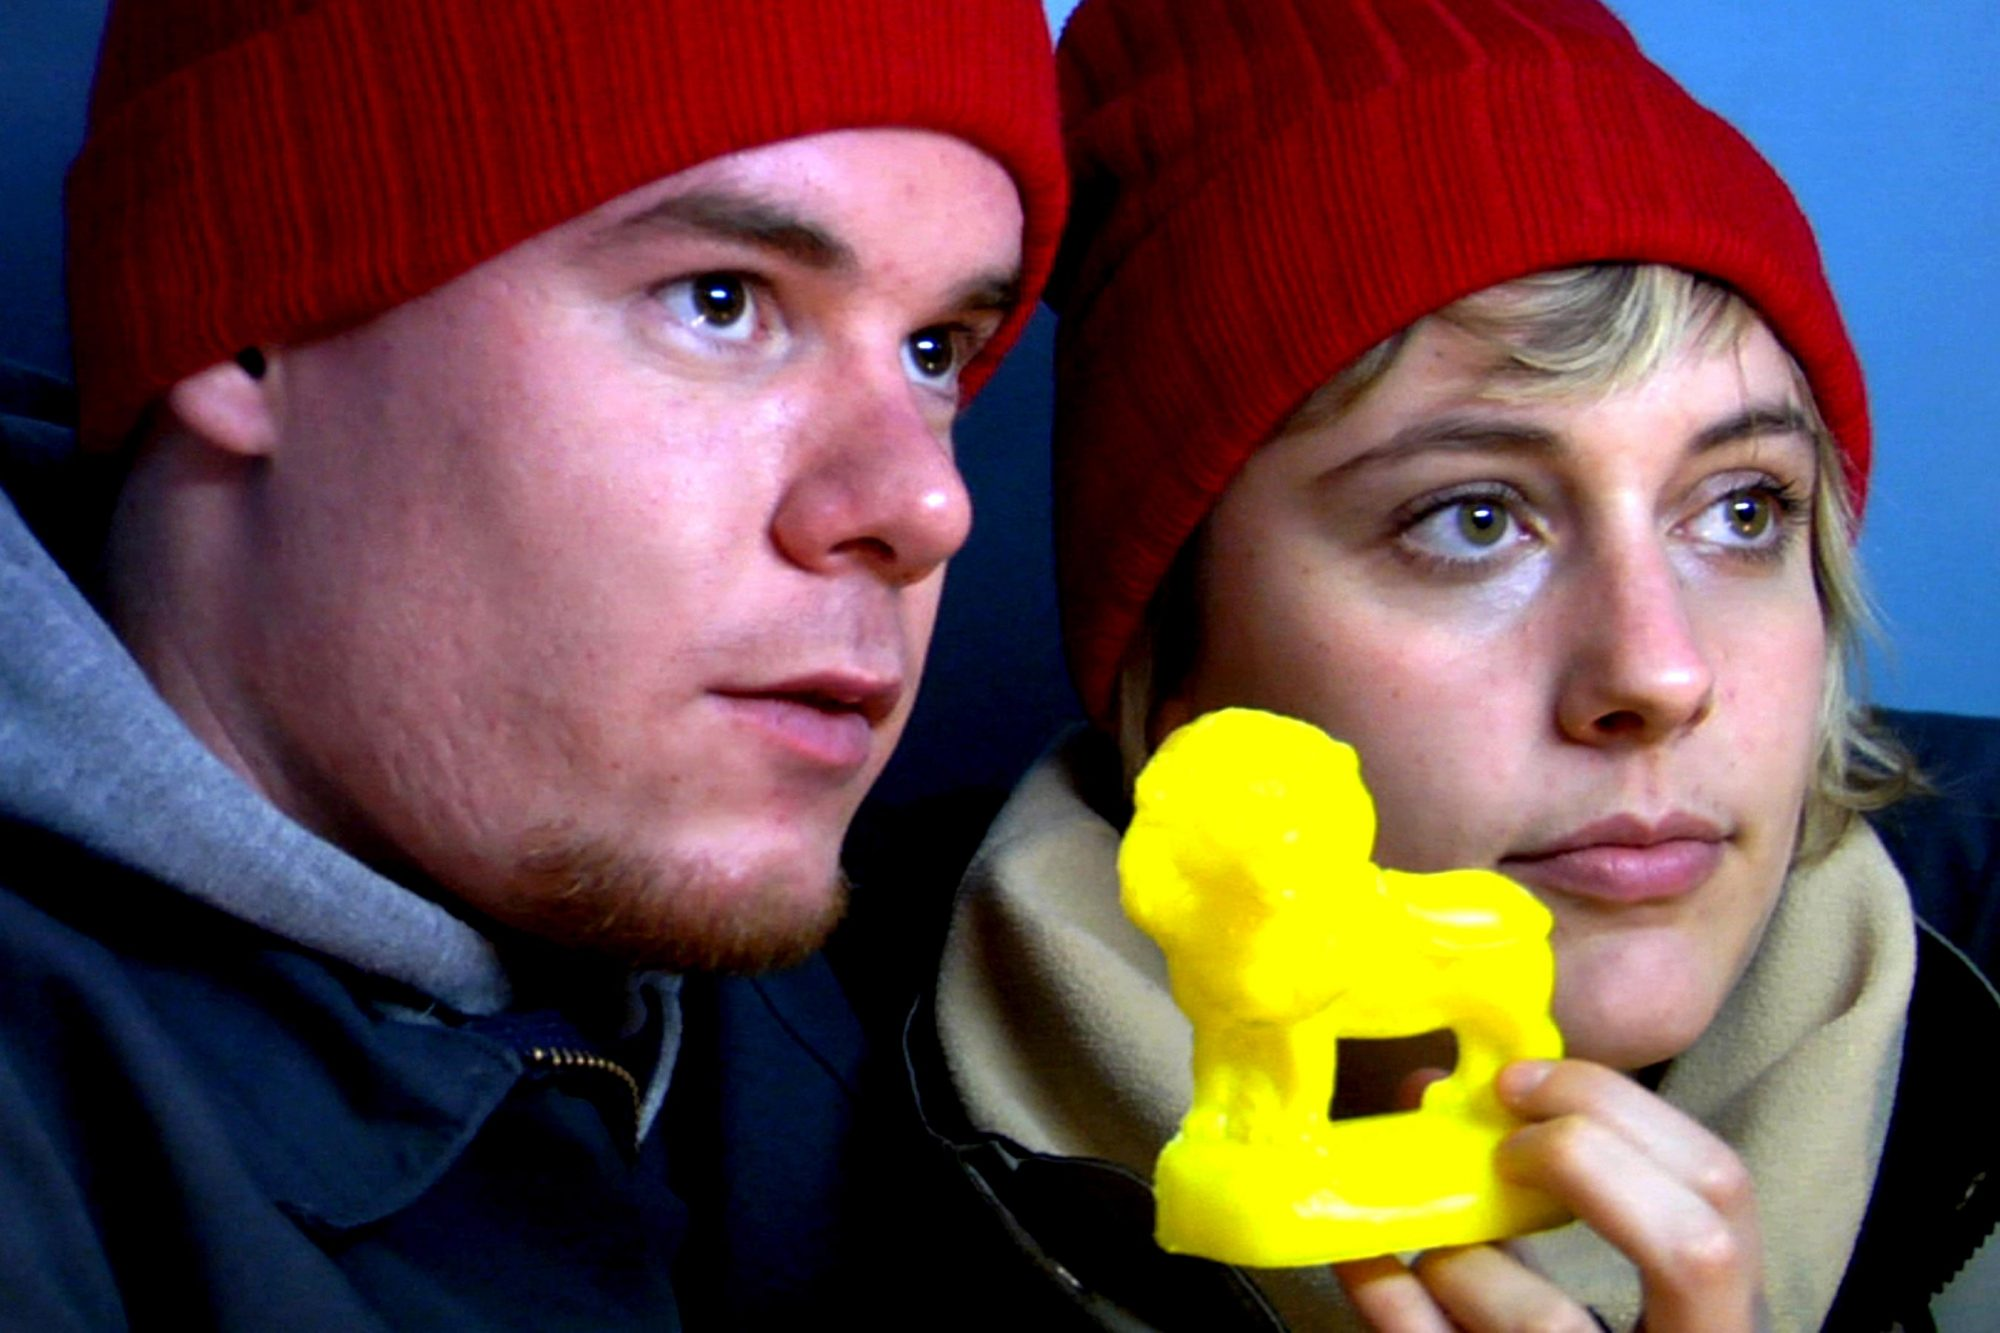 NIGHTS AND WEEKENDS, from left: Joe Swanberg, Greta Gerwig, 2008. Ph: Matthias Grunsky/©IFC Films/Co